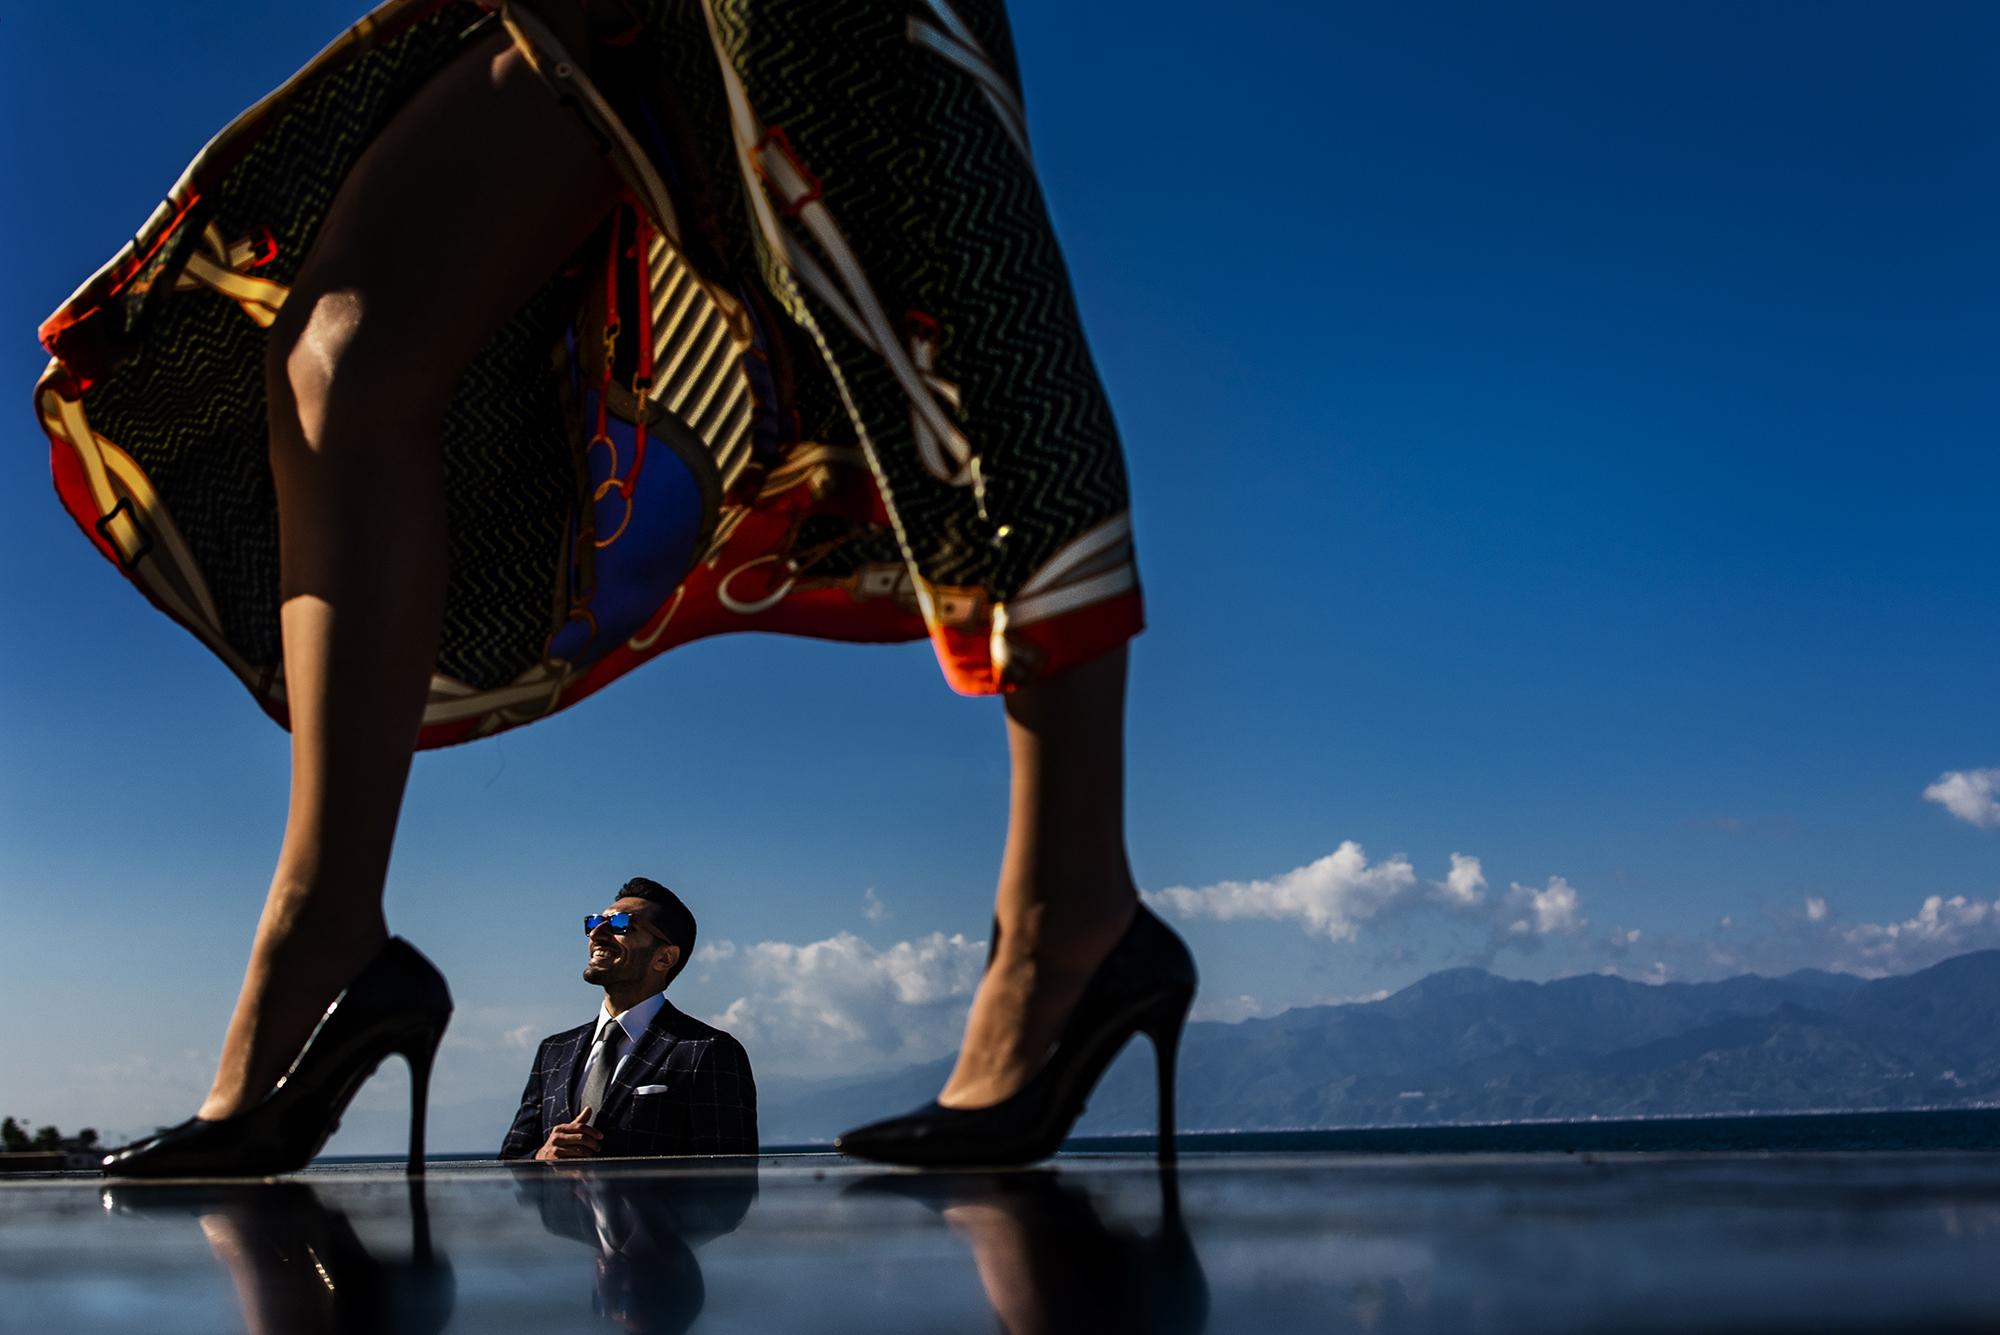 Groom framed between bride's legs - photo by Victor Lax